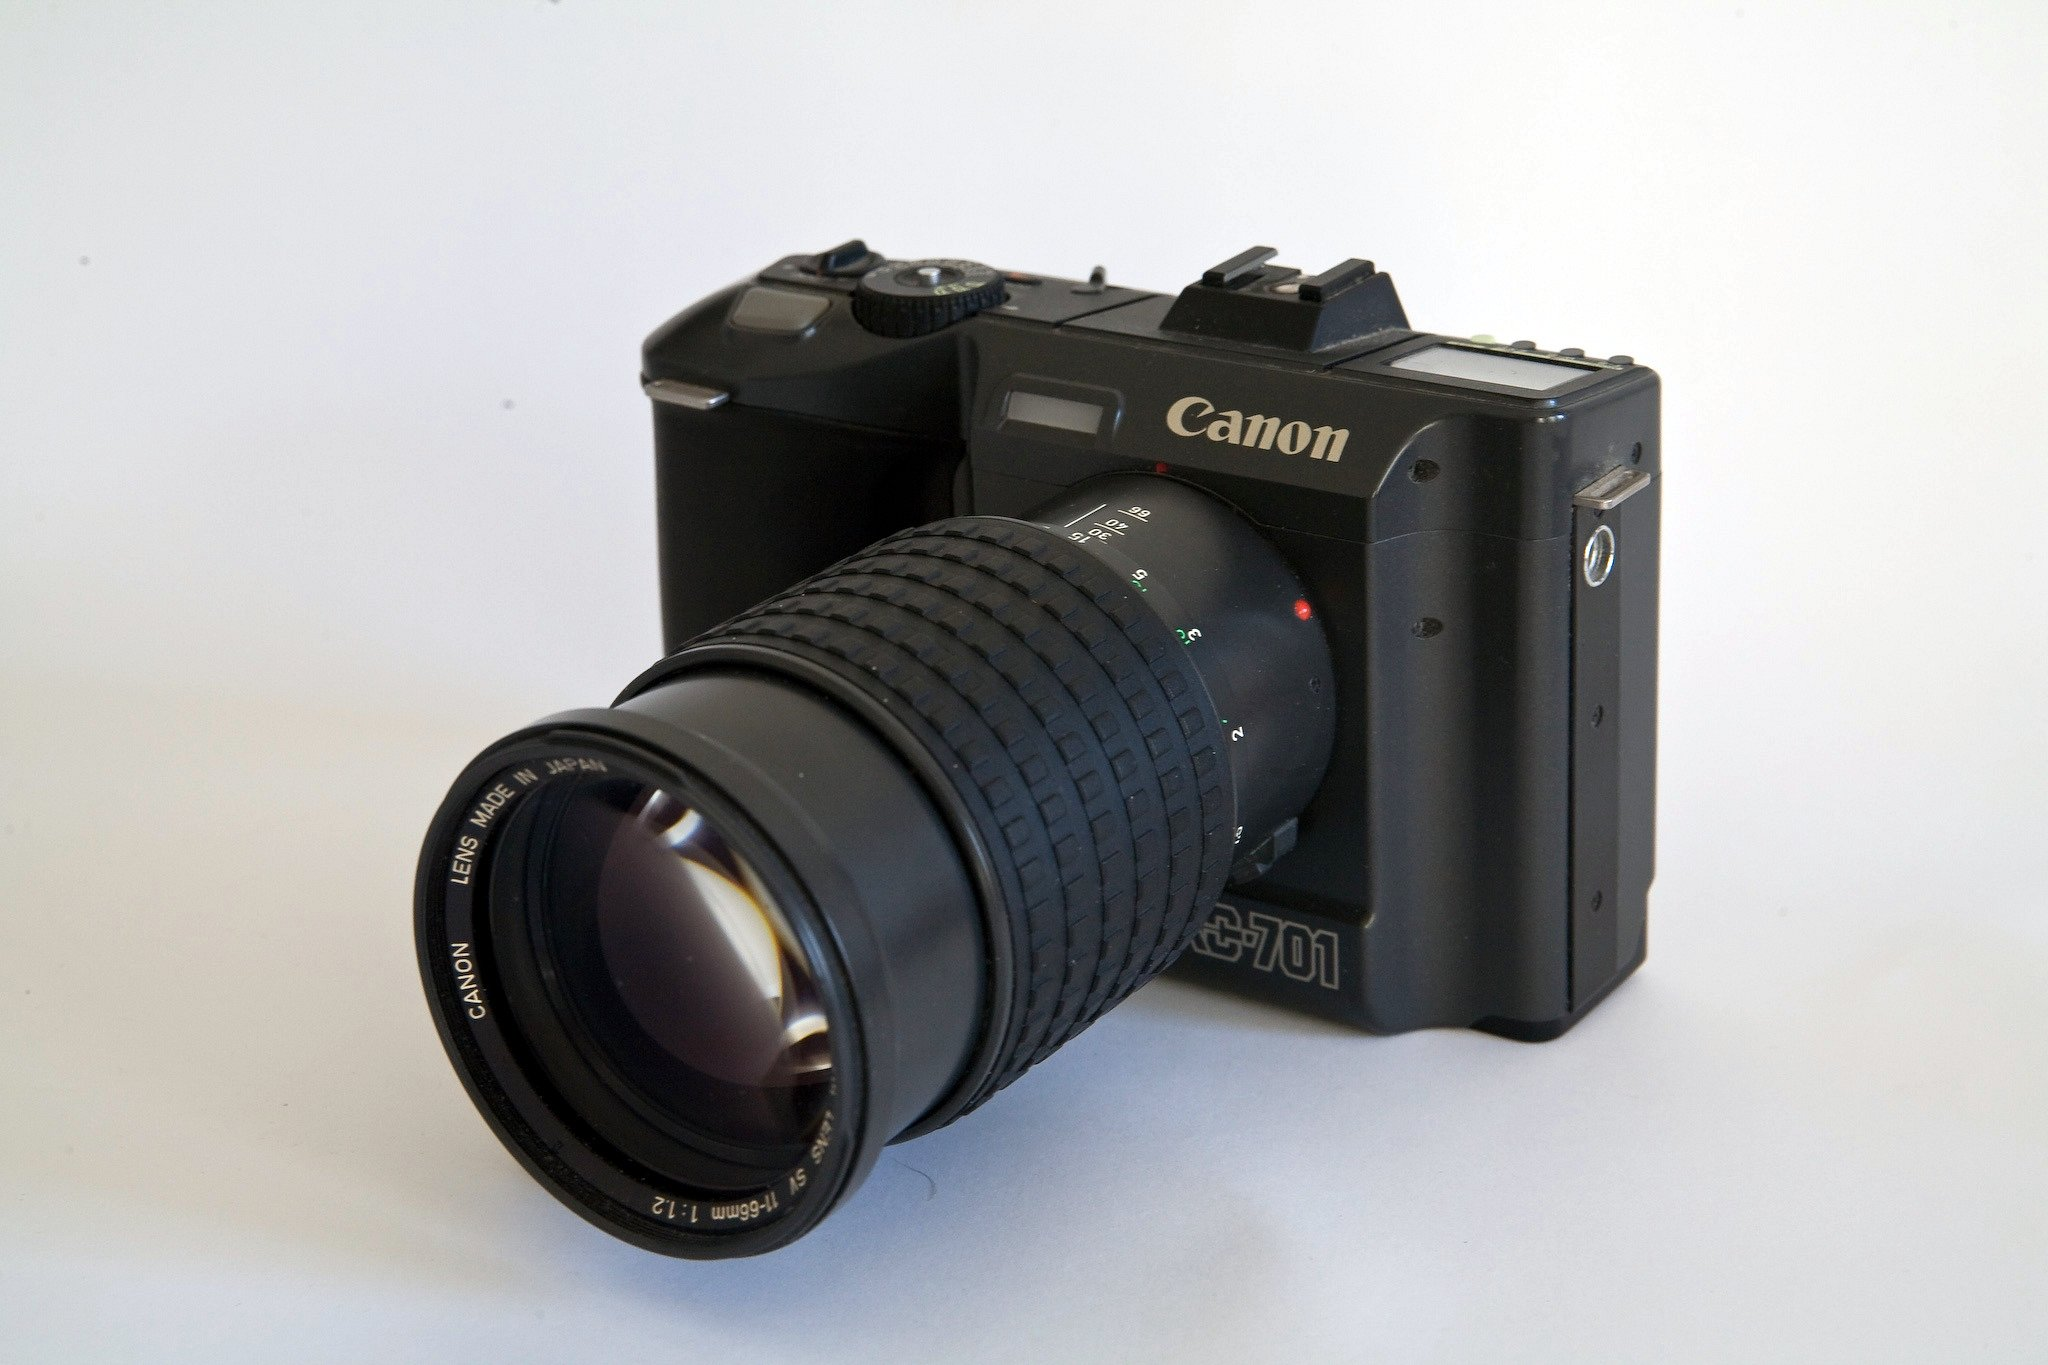 Canon RC-701 (1986)